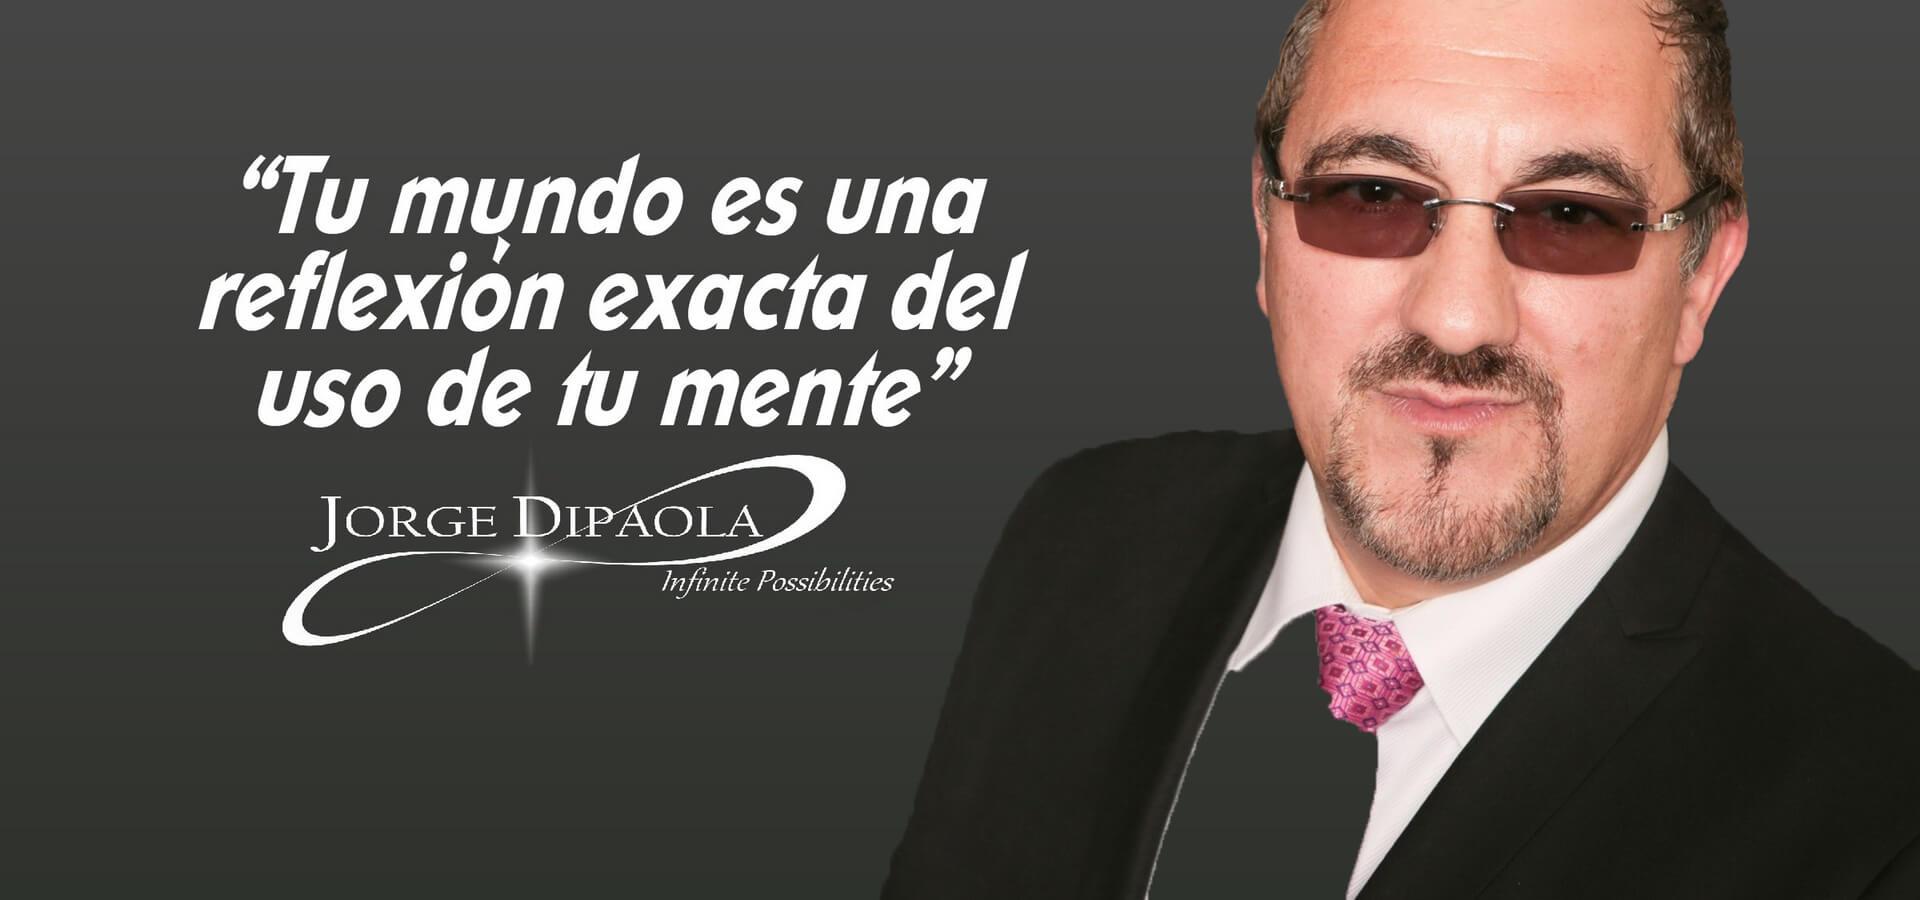 Jorge Di Paola pic 04